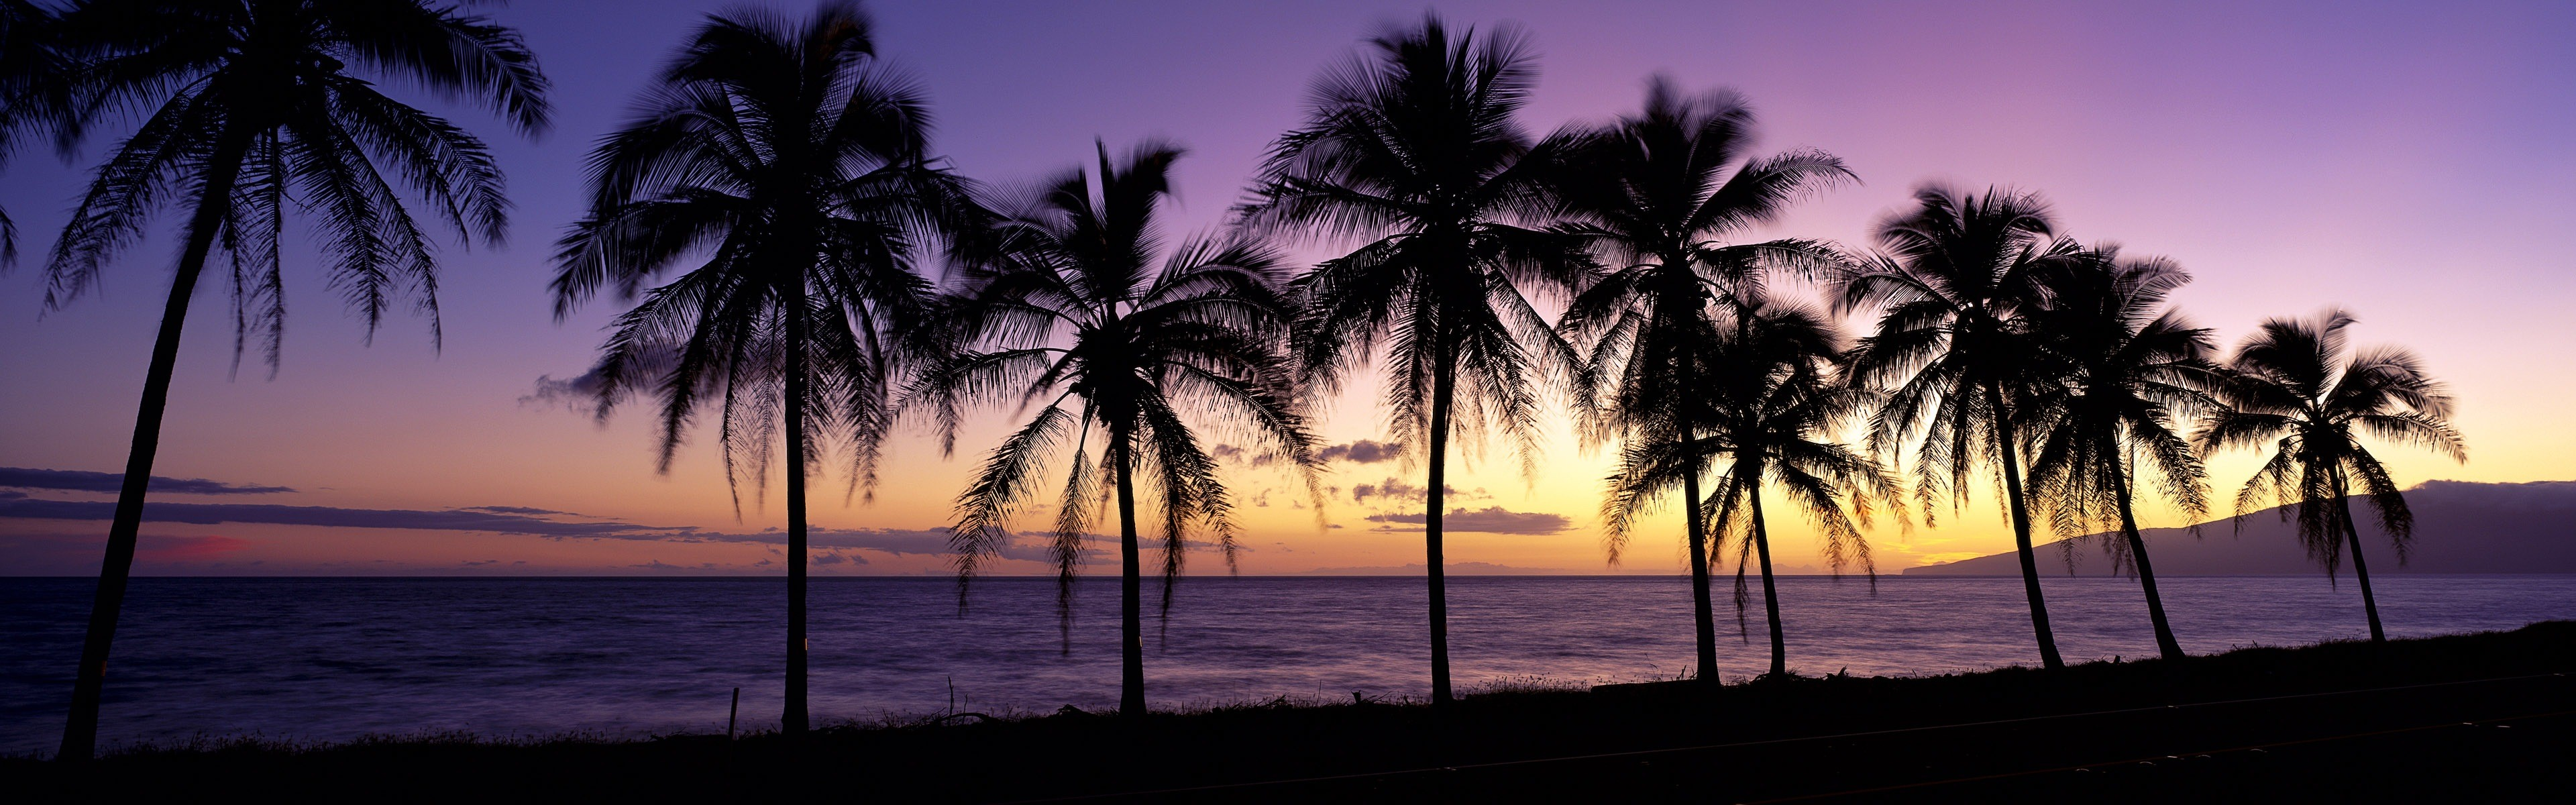 Beautiful beach sunset, Windows 8 panoramic widescreen wallpapers #1 .